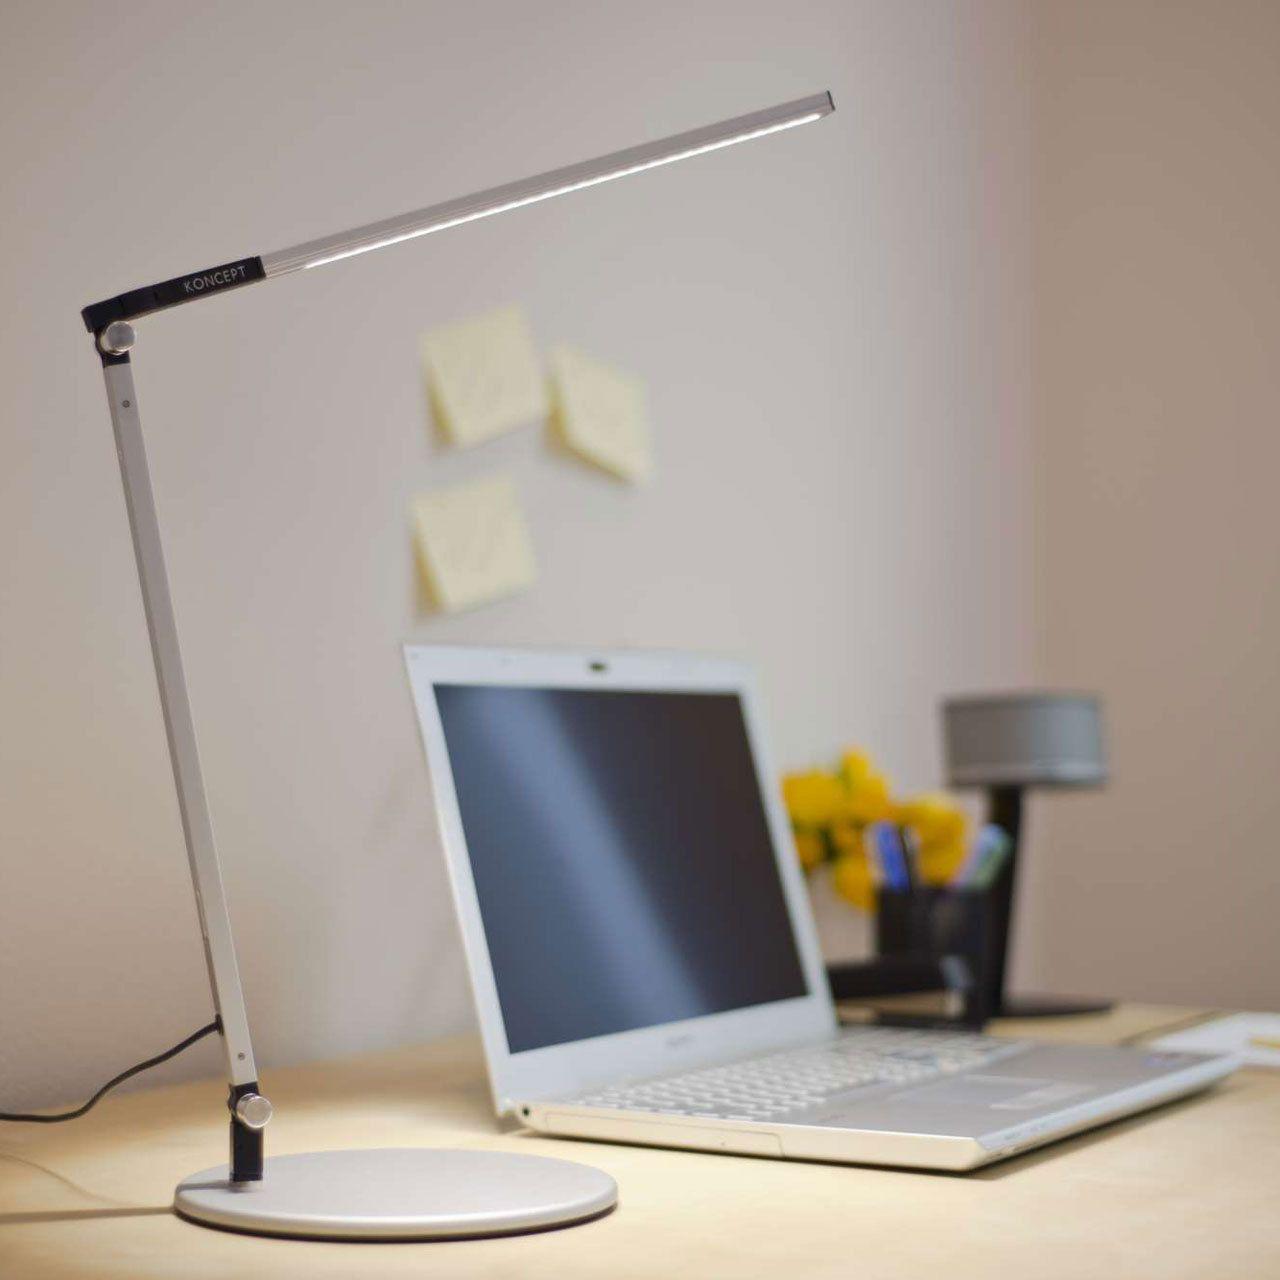 Z bar solo mini gen 3 led desk lamp koncept desk lamp desk lamp aloadofball Image collections